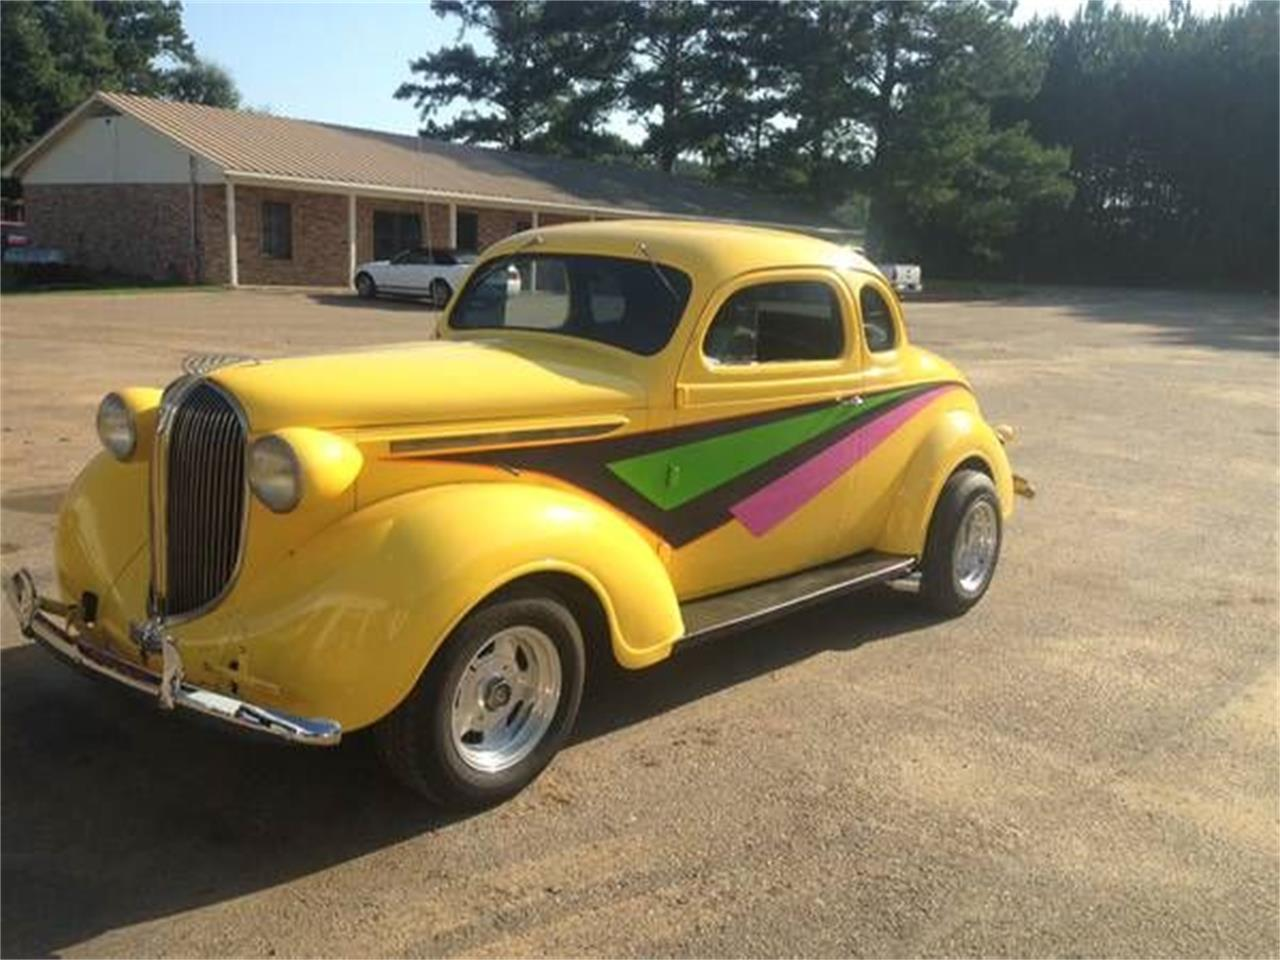 Muncie Car Dealers >> 1938 Plymouth Coupe for Sale | ClassicCars.com | CC-1120499